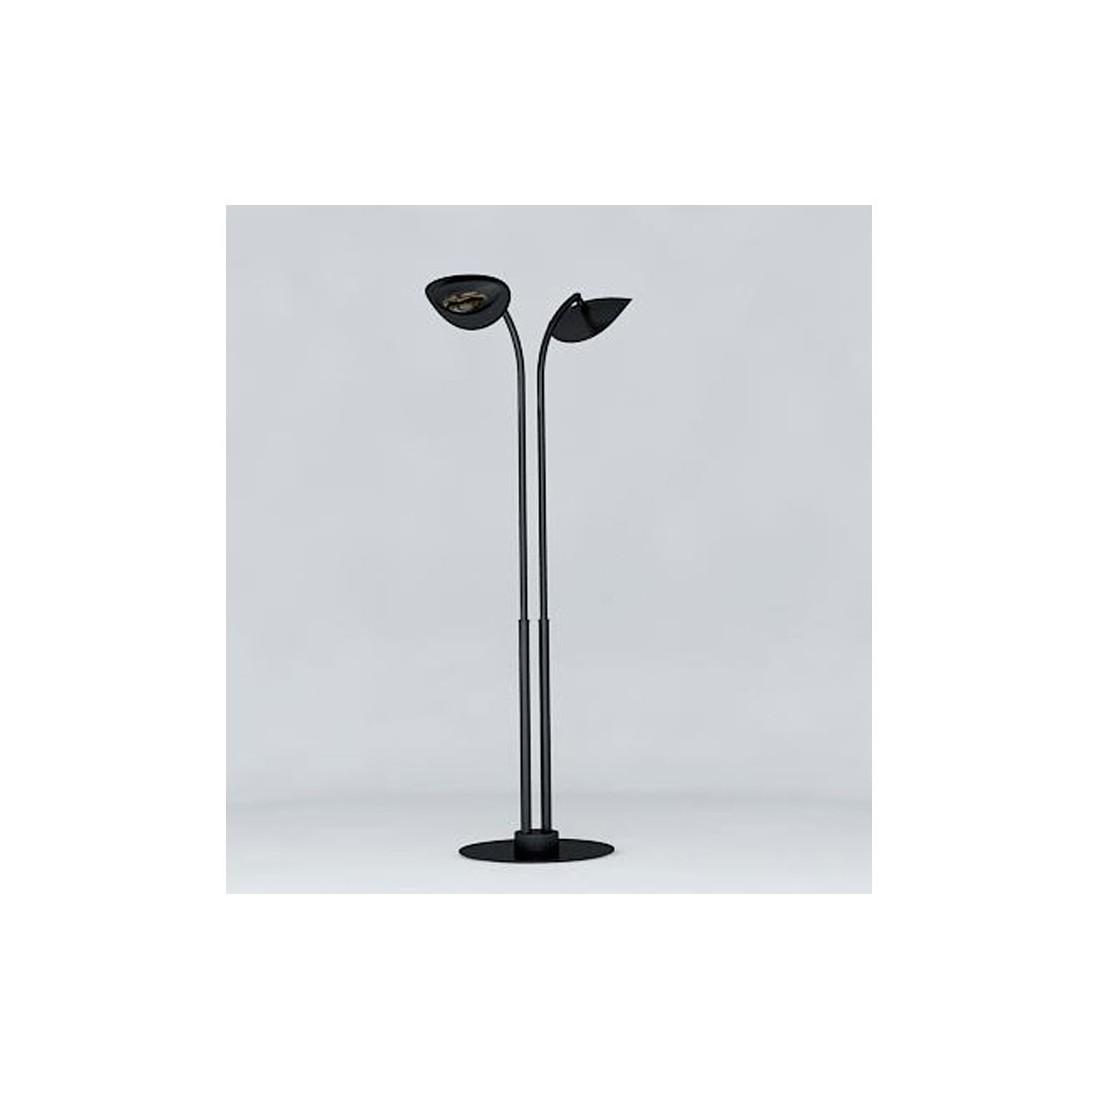 Lampe chauffante infrarouge hotdoor lampadaire simple avec tige moyenne - Lampadaire chauffant terrasse ...